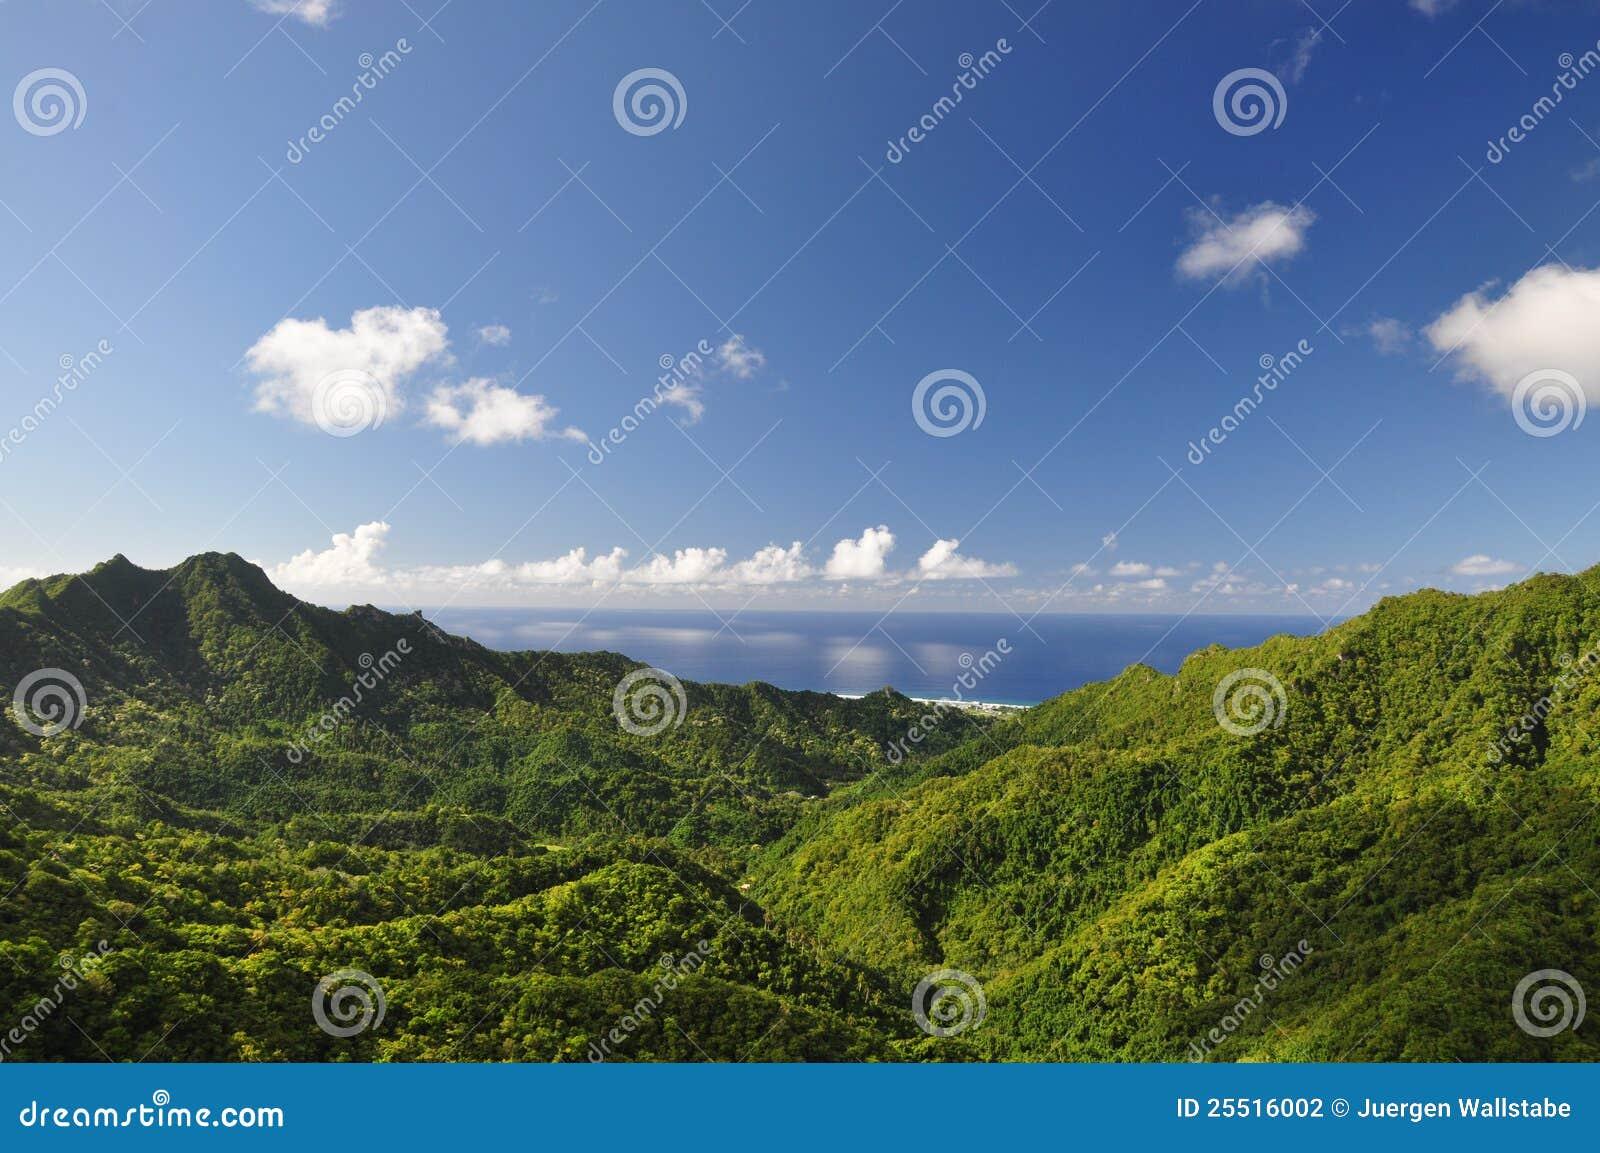 Download Mountain View Of Rarotonga, Cook Islands Stock Photo - Image of paradise, island: 25516002